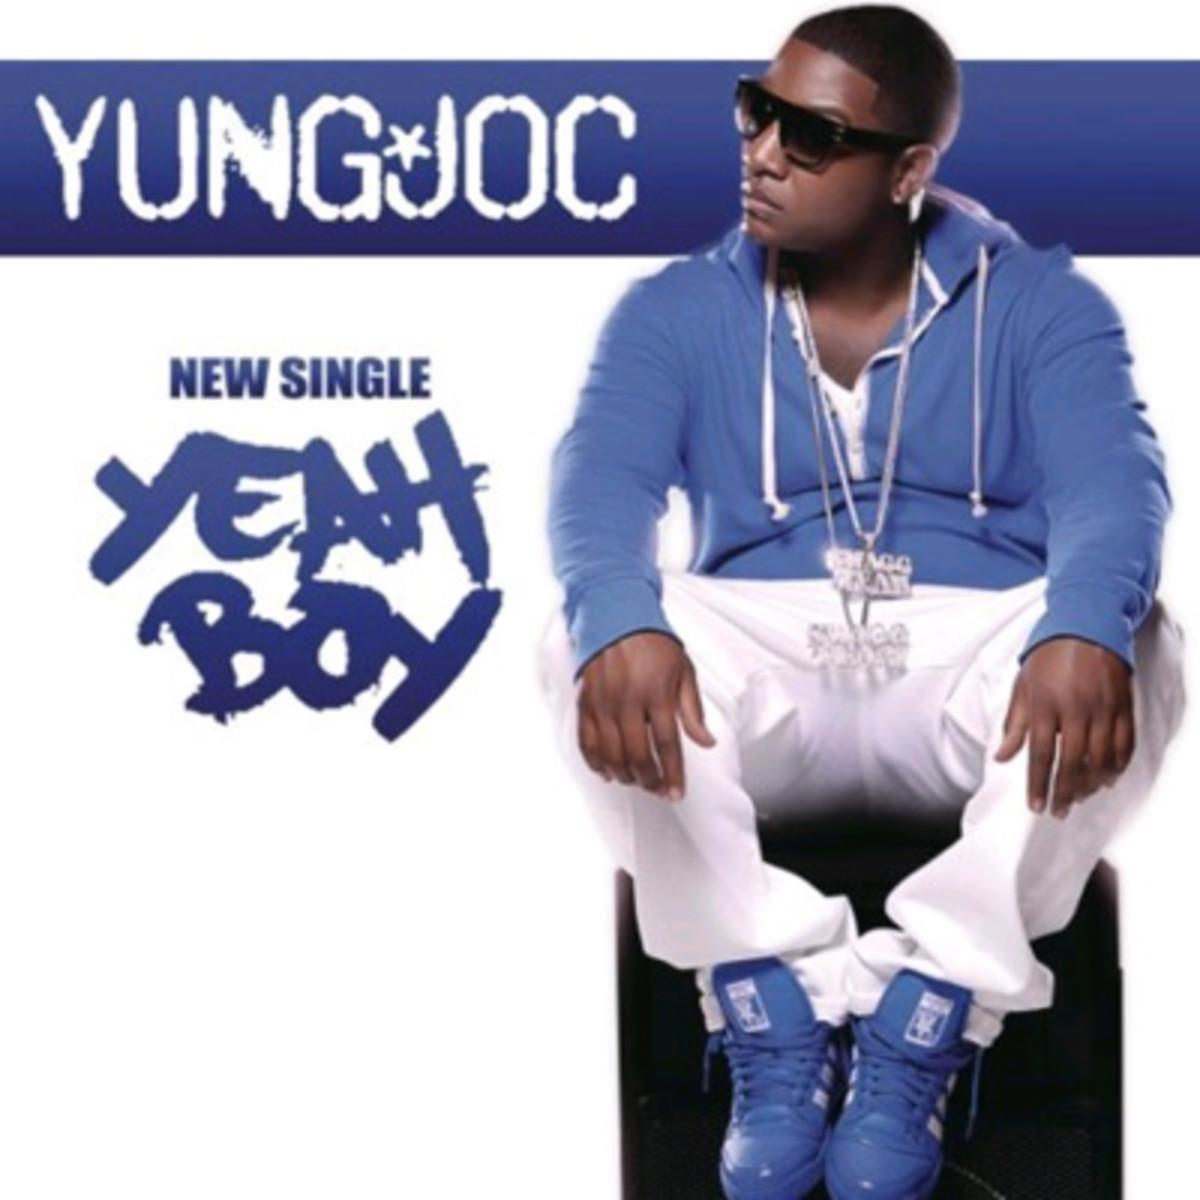 yungjoc-yeahboy.jpg